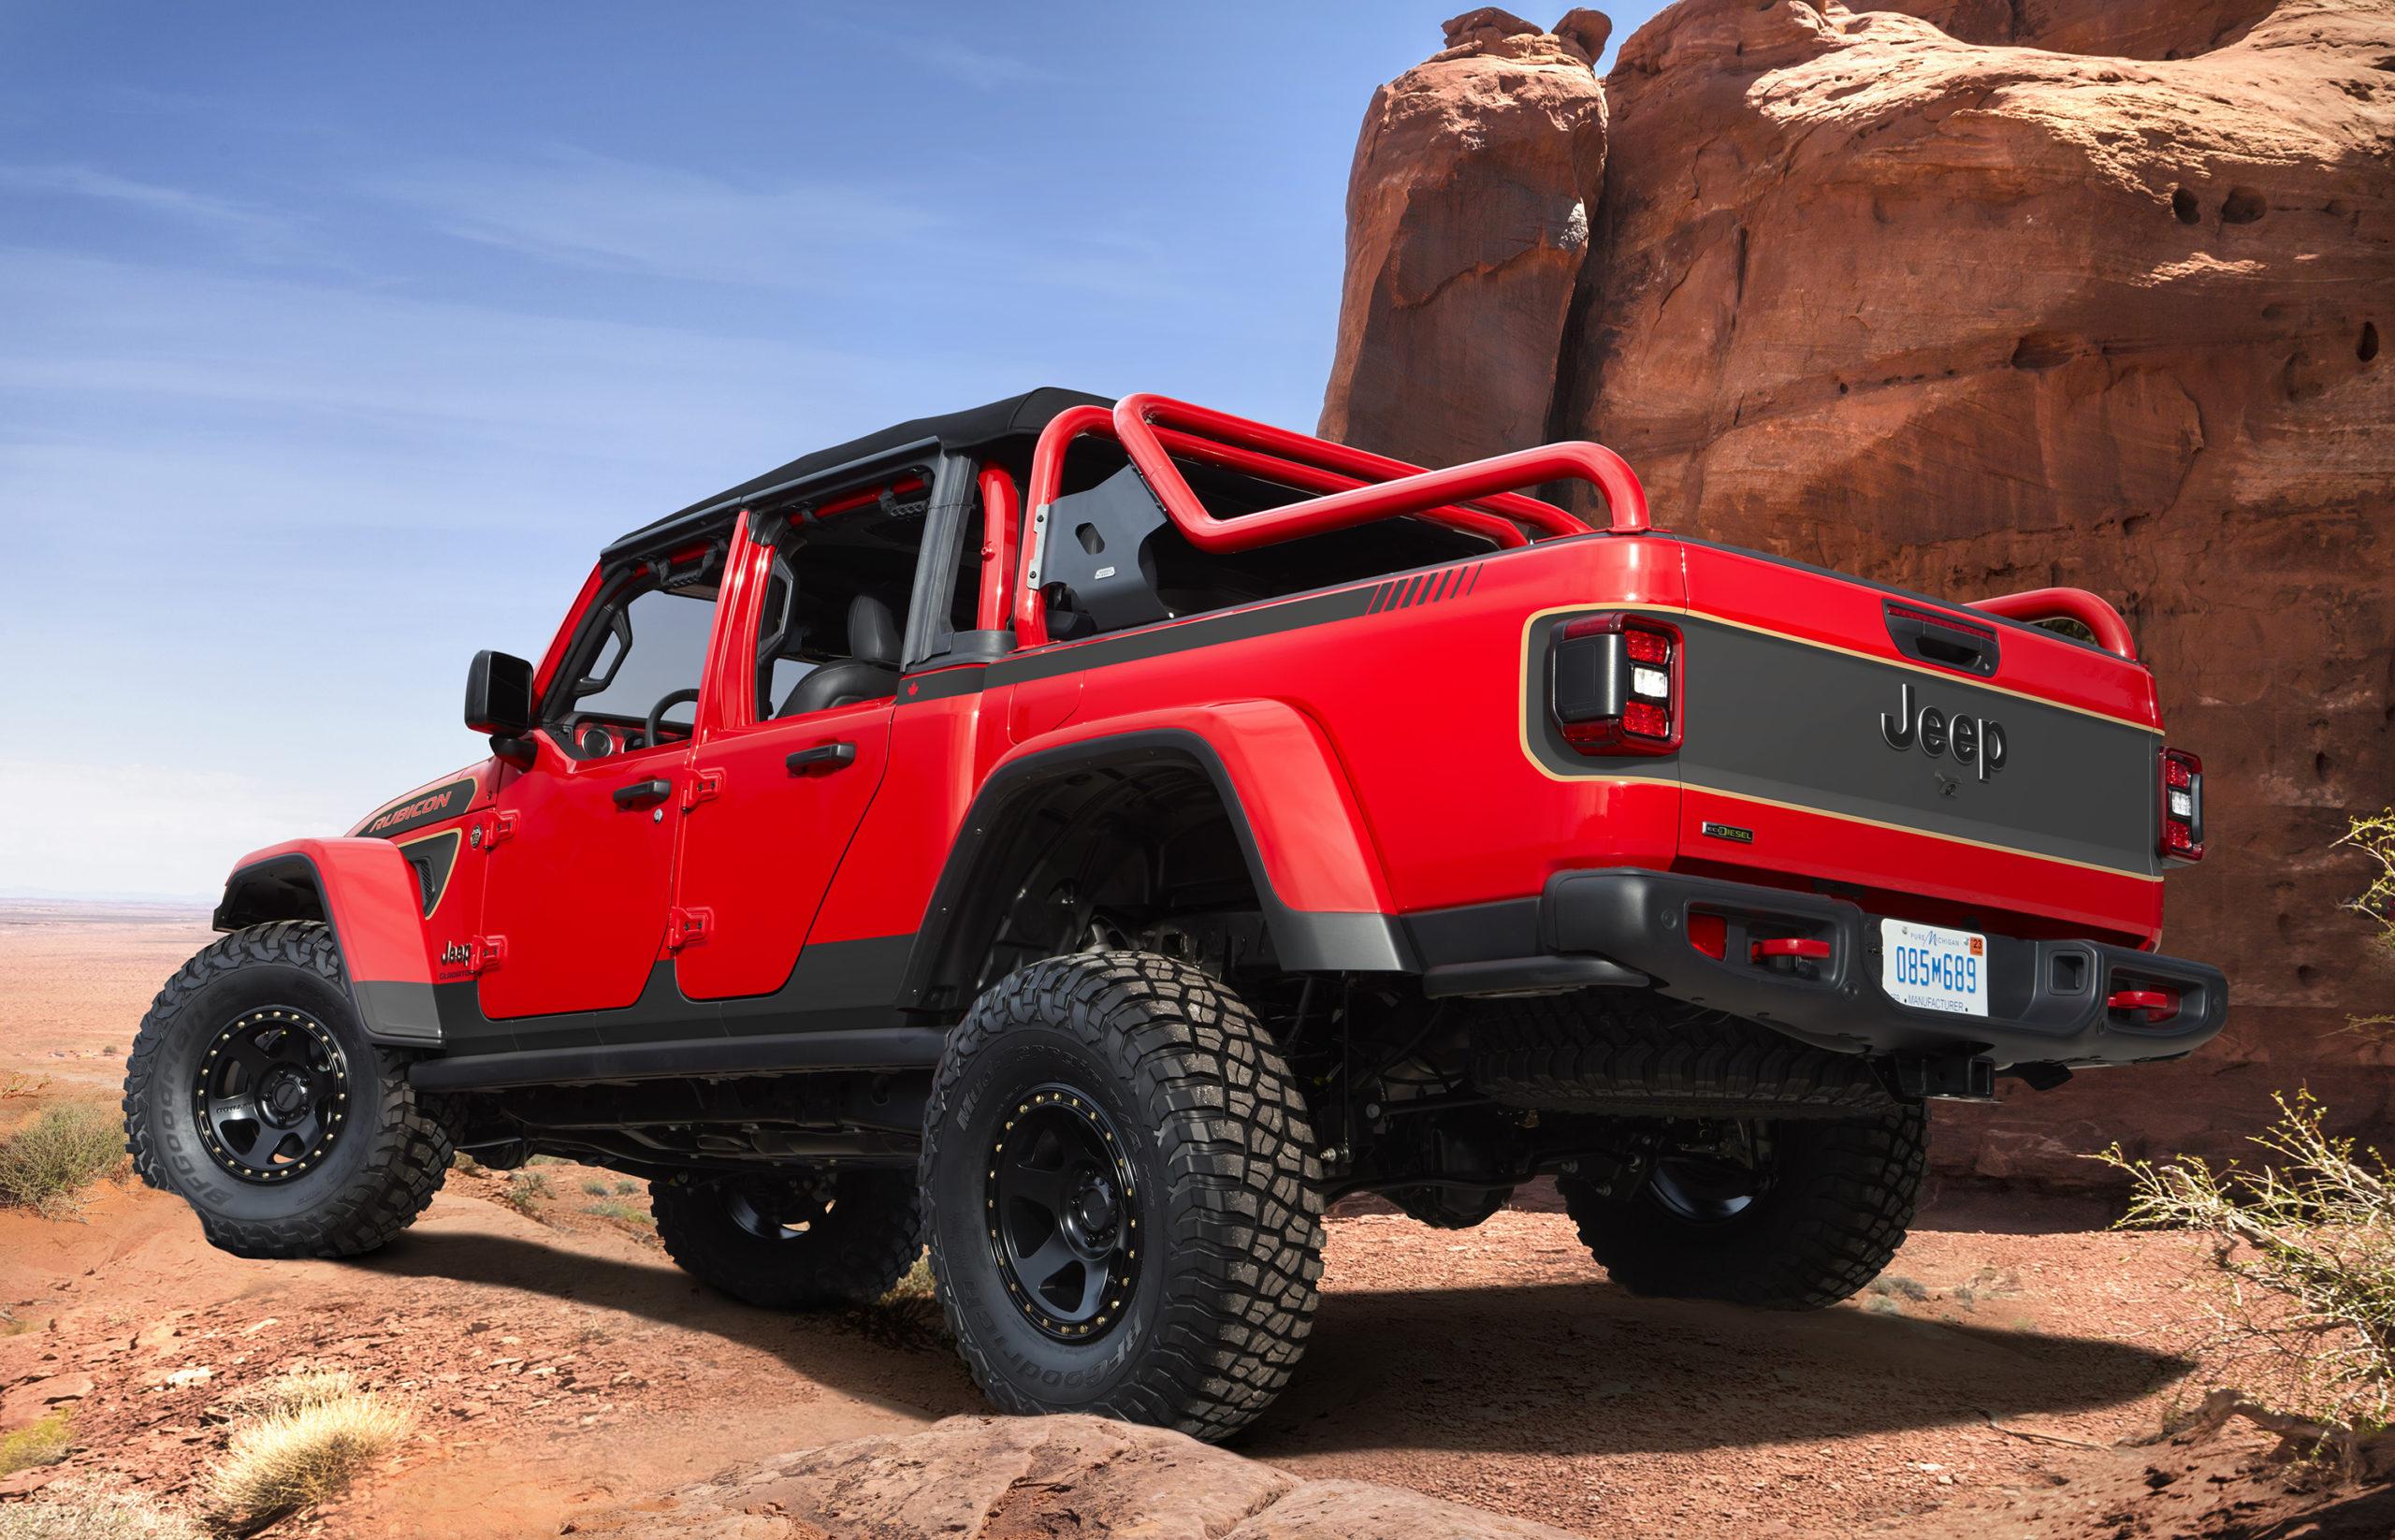 2021 Jeep Red Bare Concept